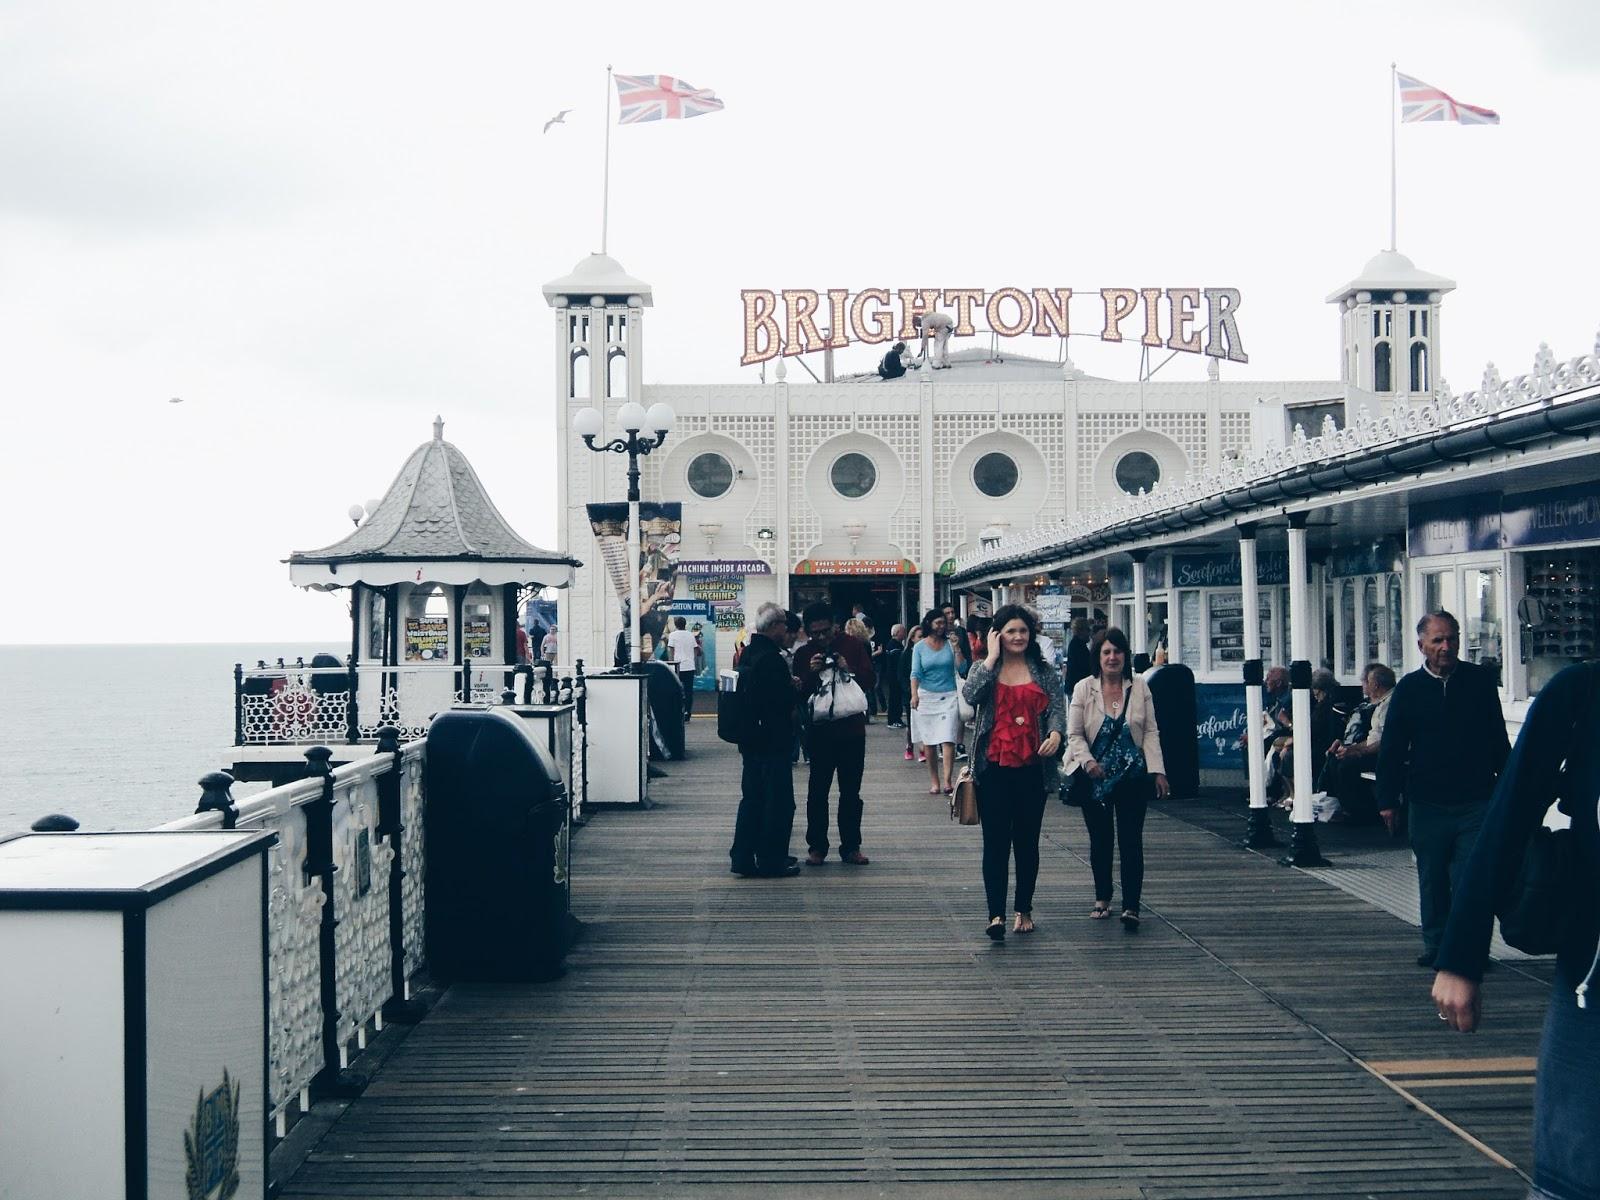 C A R I S S A L A M: Day Trip to Brighton